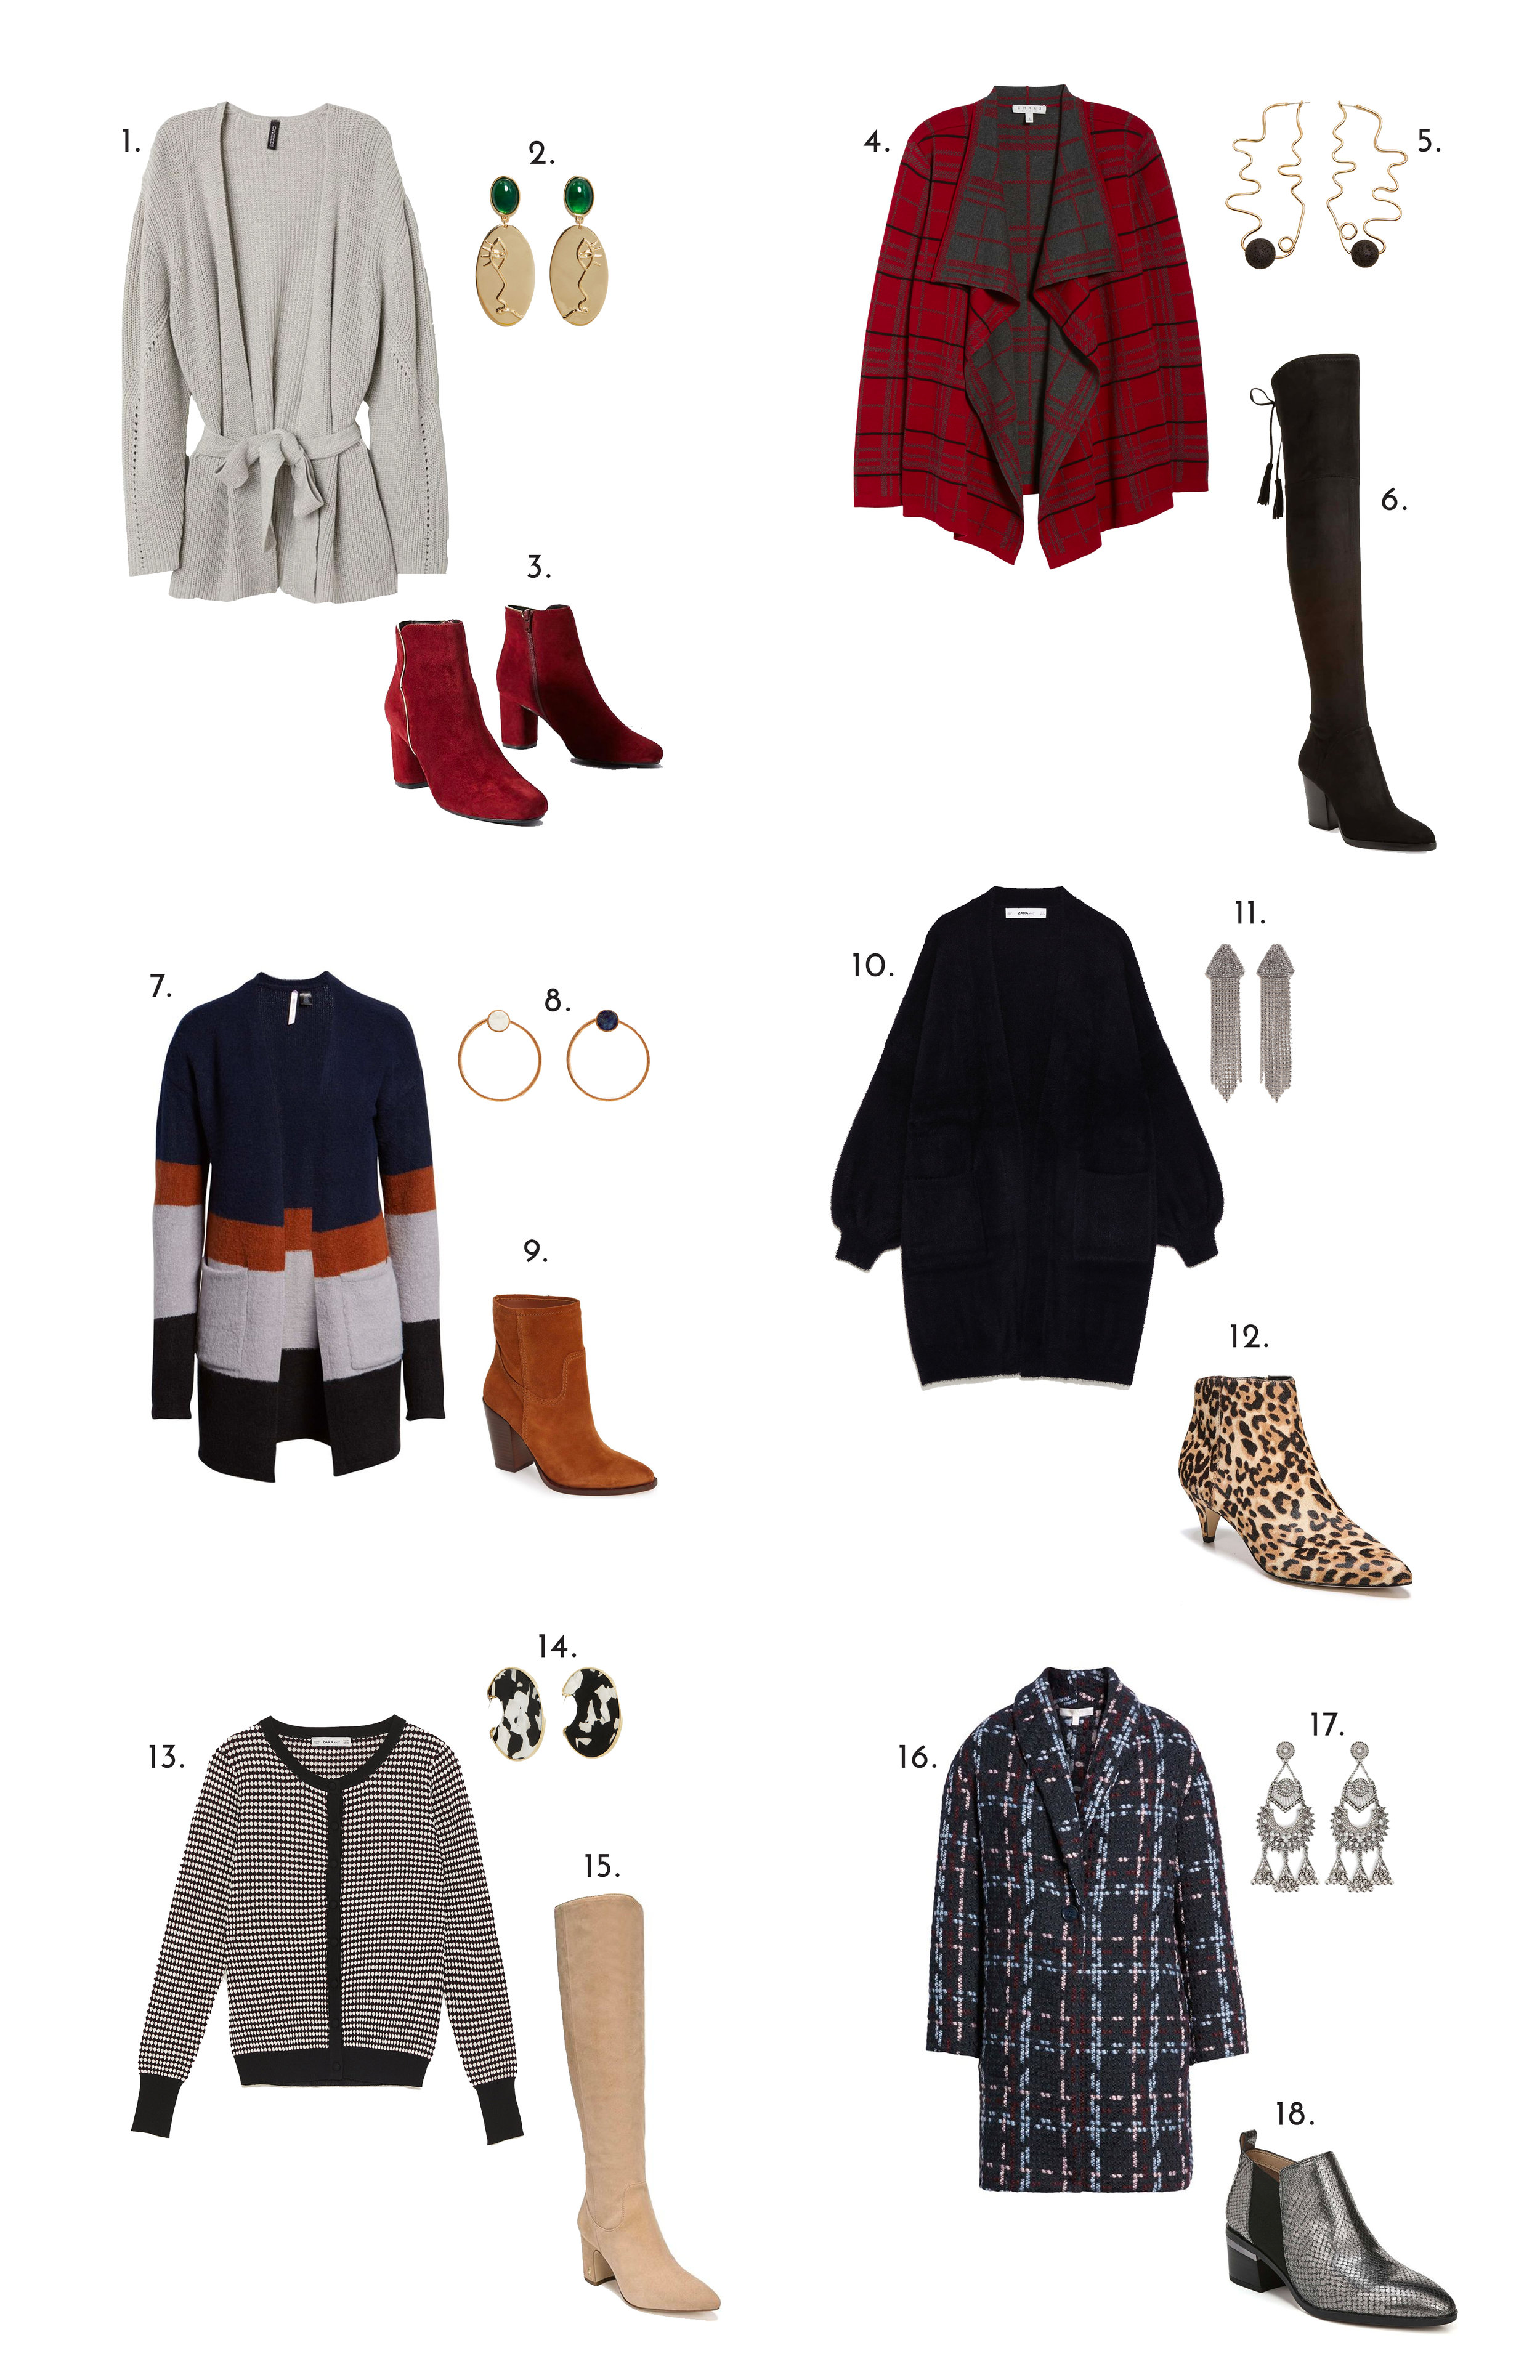 1.  H&M Tie Cardigan , 2.  Mango Face Earrings , 3.  Anthropologie   Booties , 4.  Plaid Cardigan , 5.  Mango Abstract Earrings , 6.  Over-the-knee Boots , 7.  Color-block Sweater , 8.  Mango Hoop Earrings , 9.  Western Booties , 10.  Zara Faux Fur Knit Jacket , 11.  Mango Crystal Earrings , 12.  Leopard Booties , 13.  Zara Cardigan , 14.  Mango Tortoise Shell Earrings , 15.  Nude Knee-High Boots , 16.  Cocoon Cardigan , 17.  Forever 21 Earrings , 18.  Silver Booties